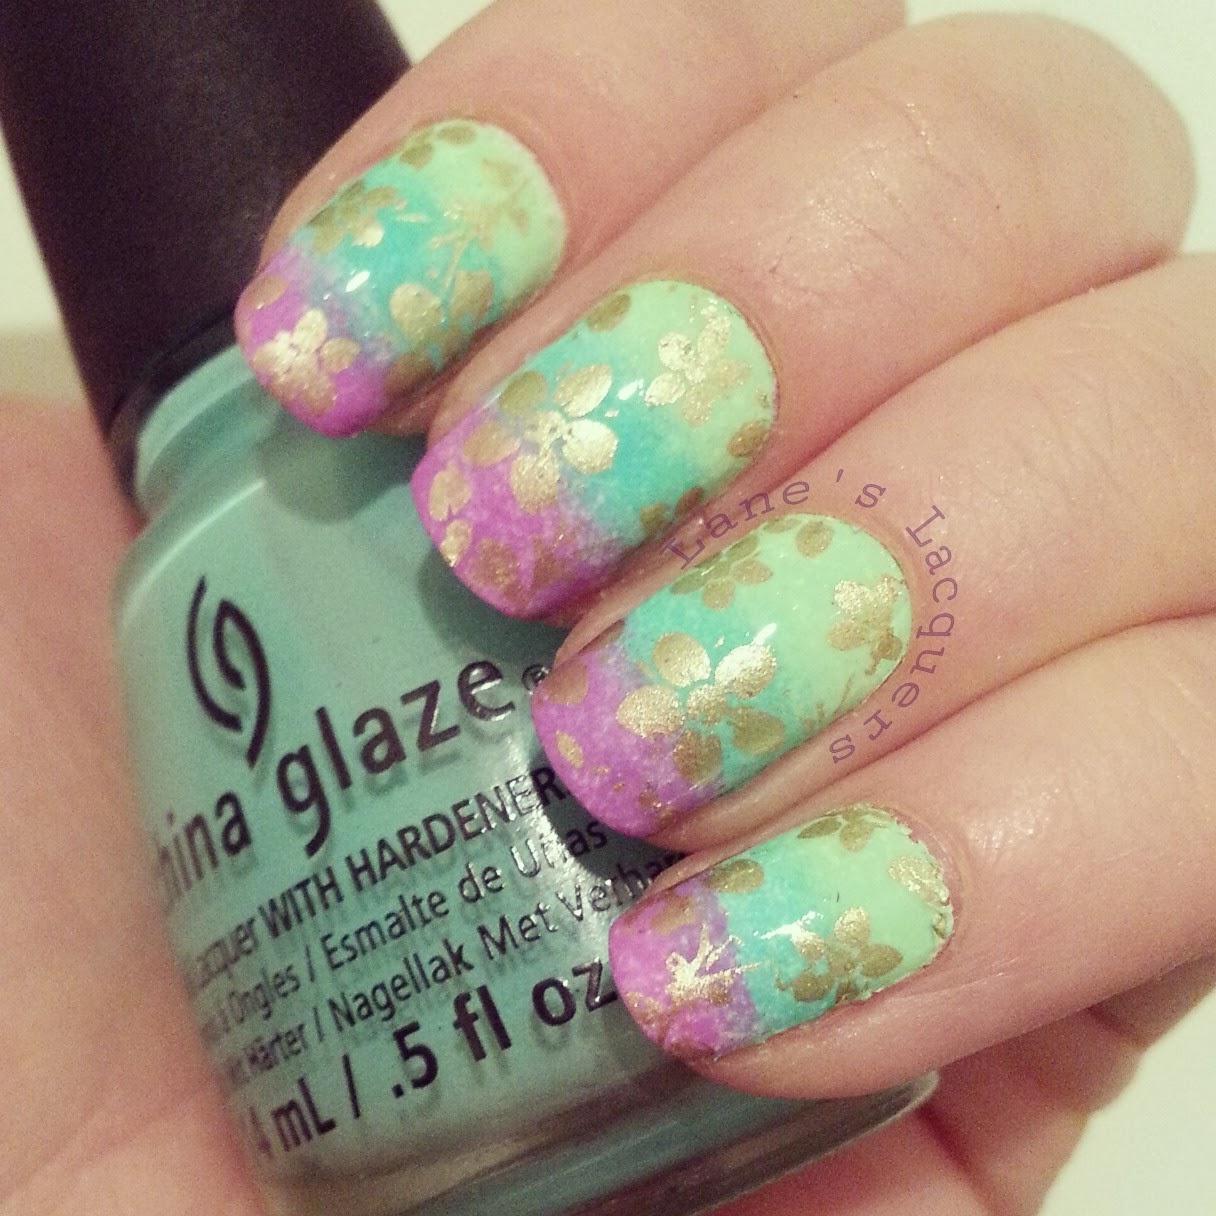 tri-polish-challenge-green-blue-purple-ombre-nails